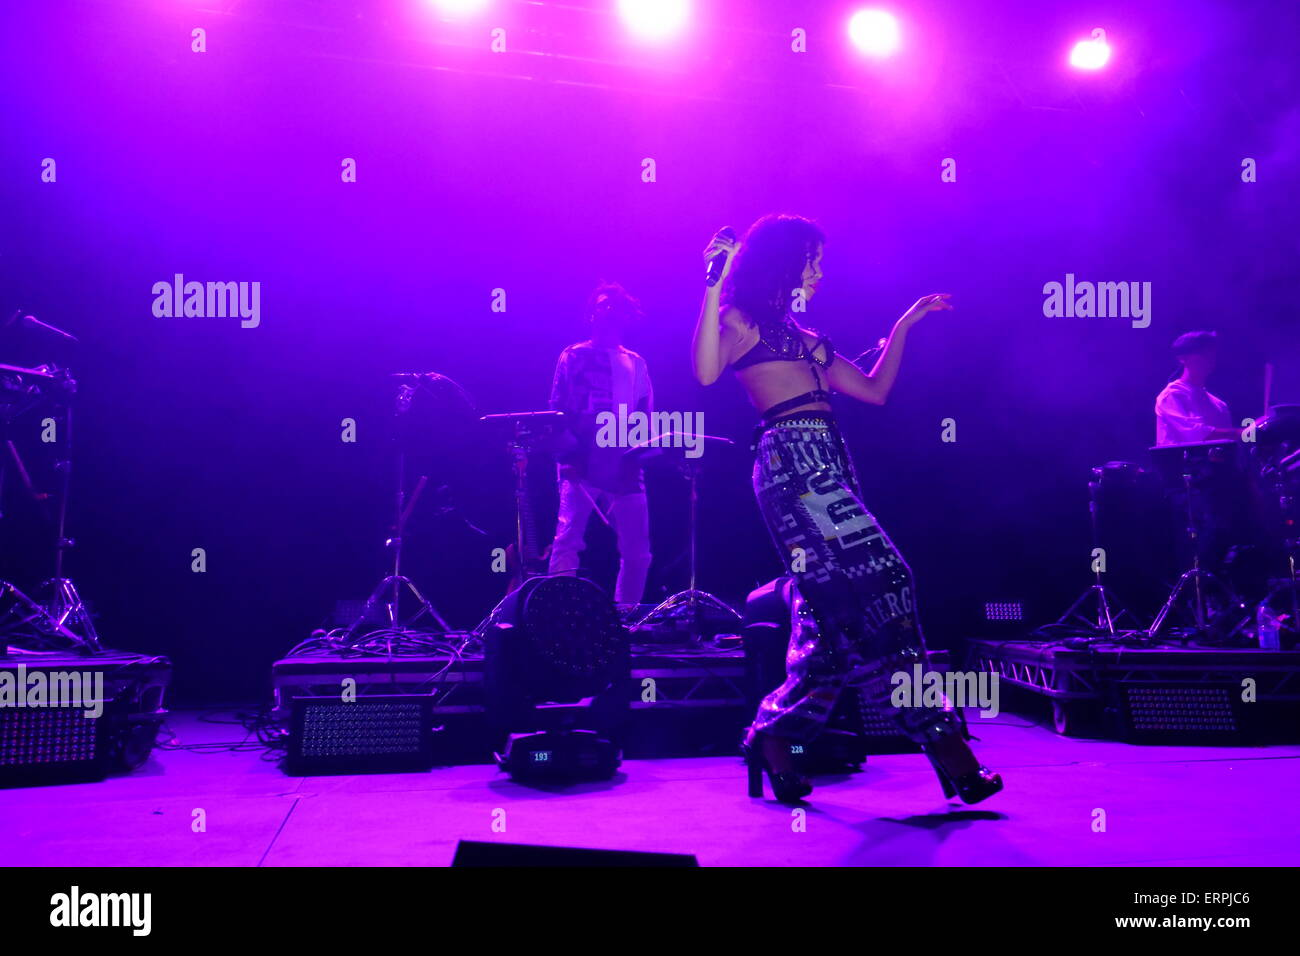 FKA Twigs plays at Field day festival wearing JP Gaultier - Stock Image